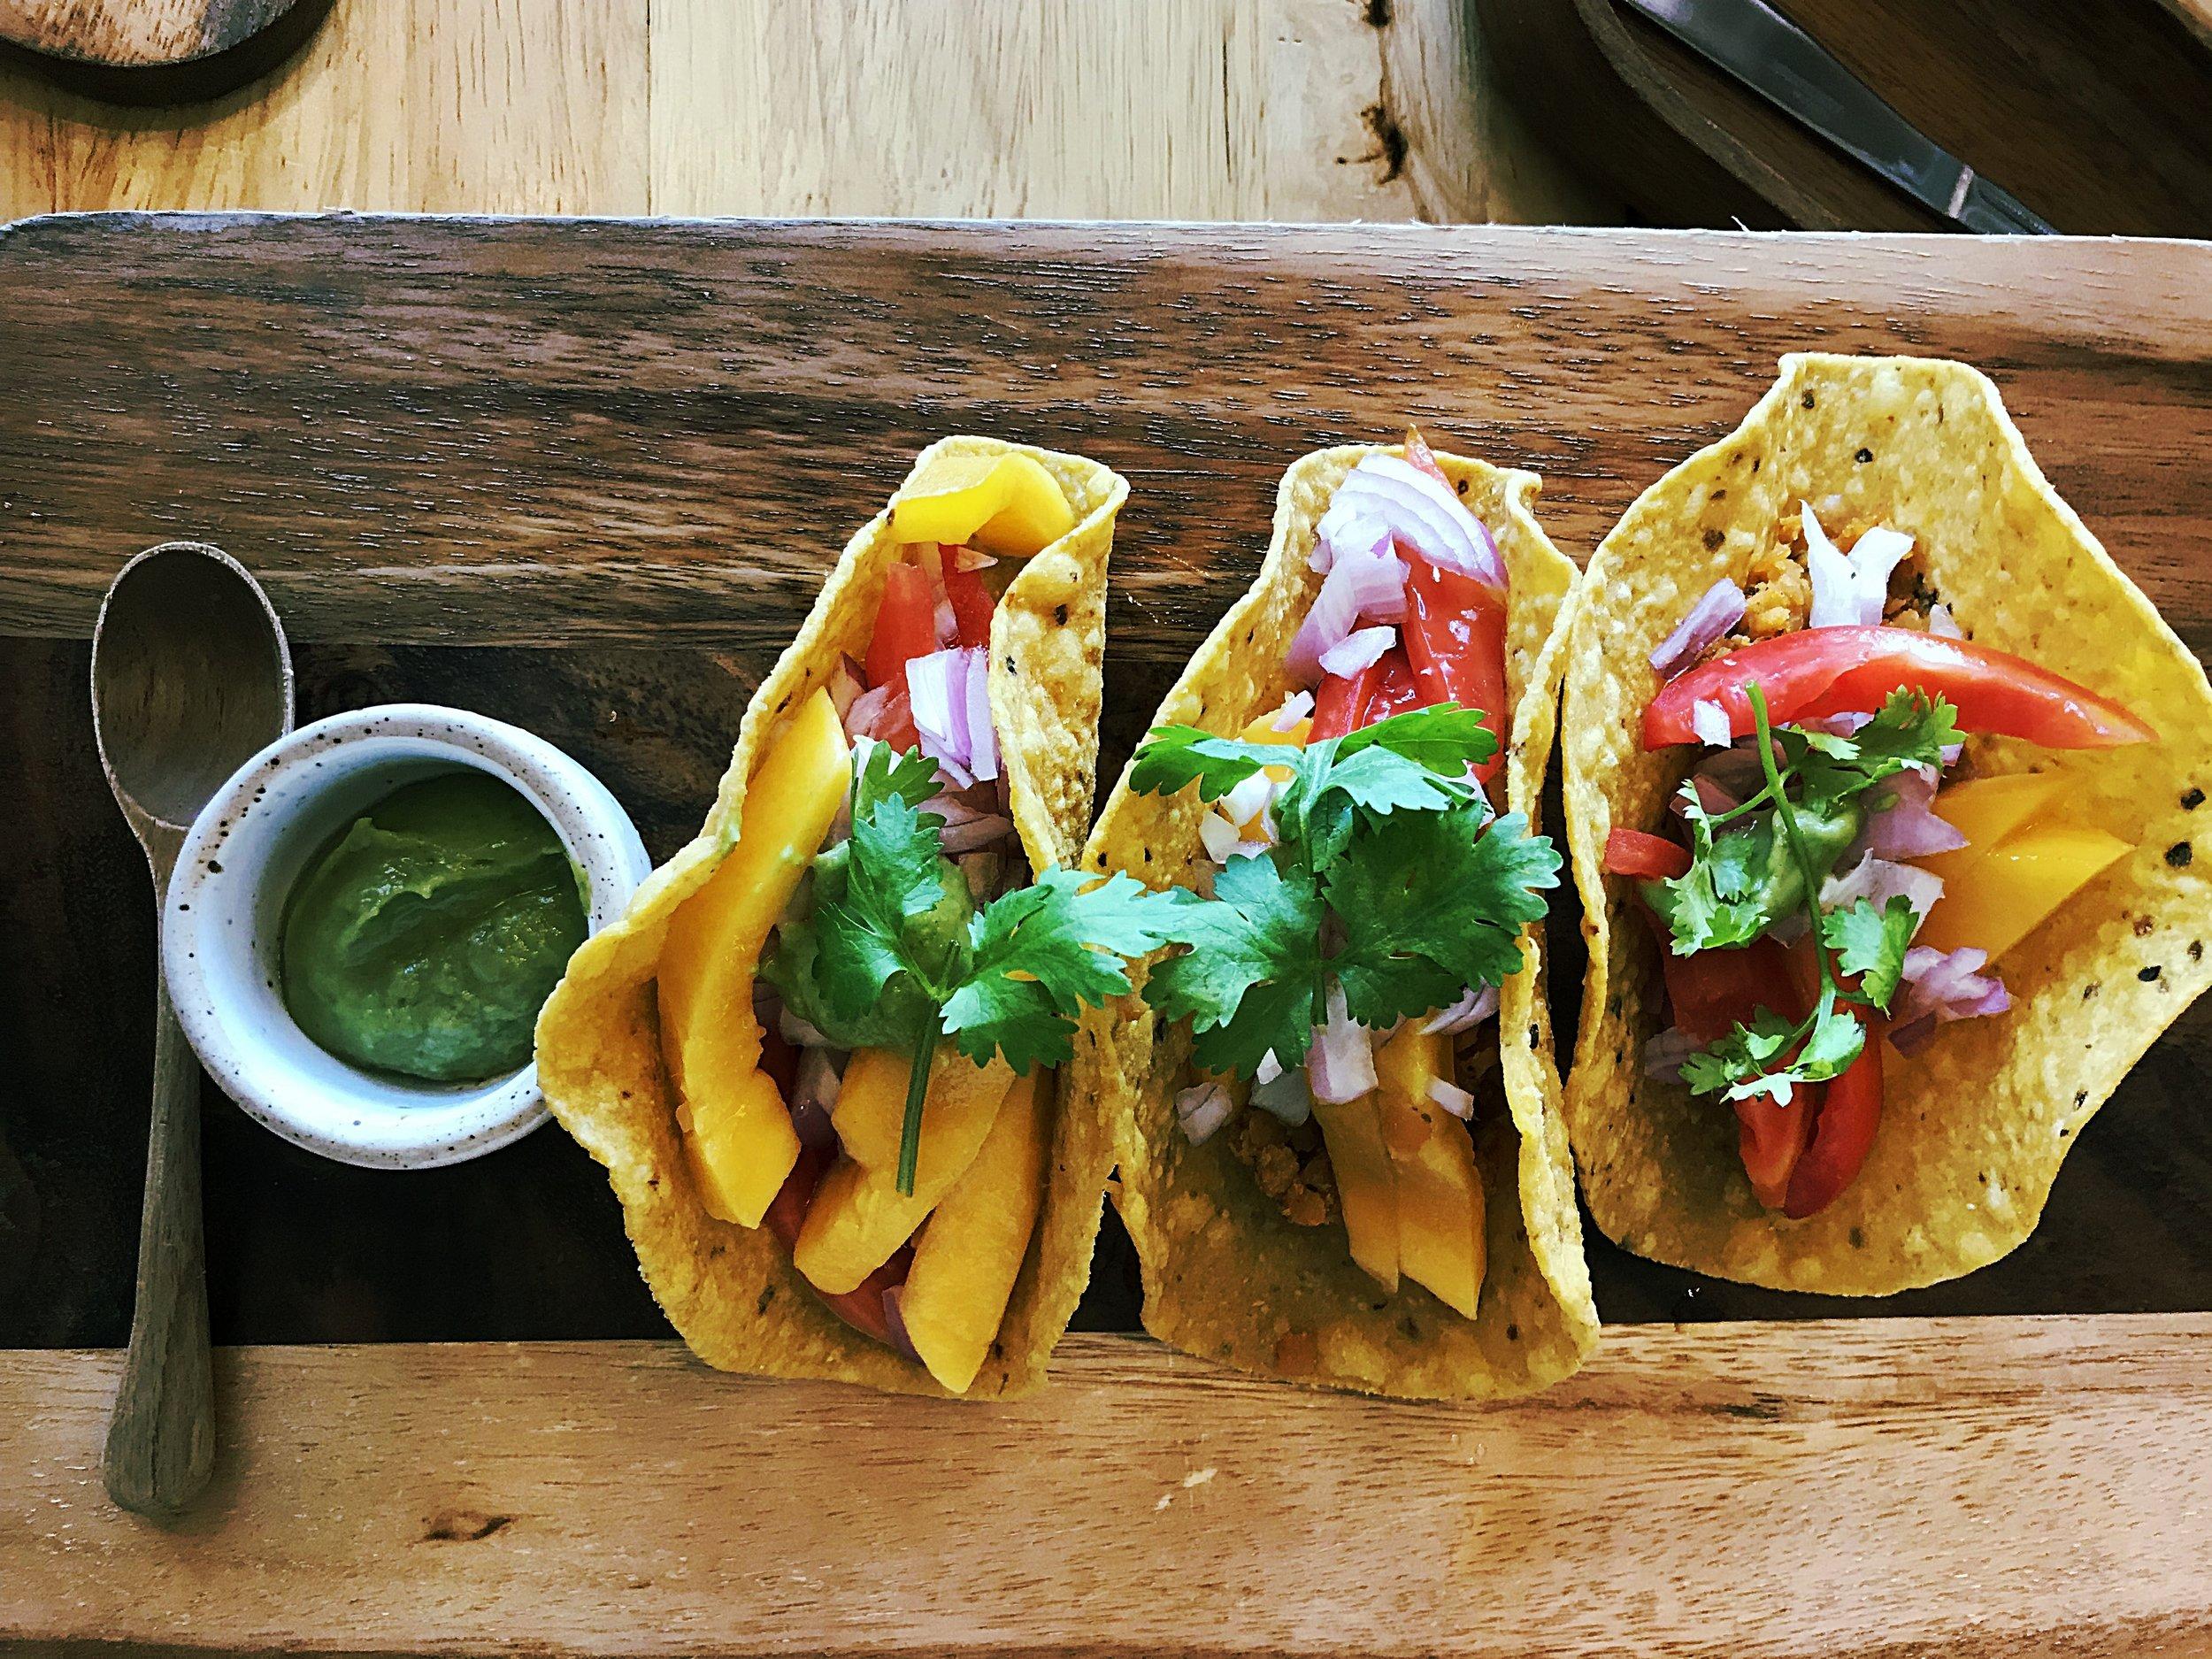 Lentil tacos with fresh mango